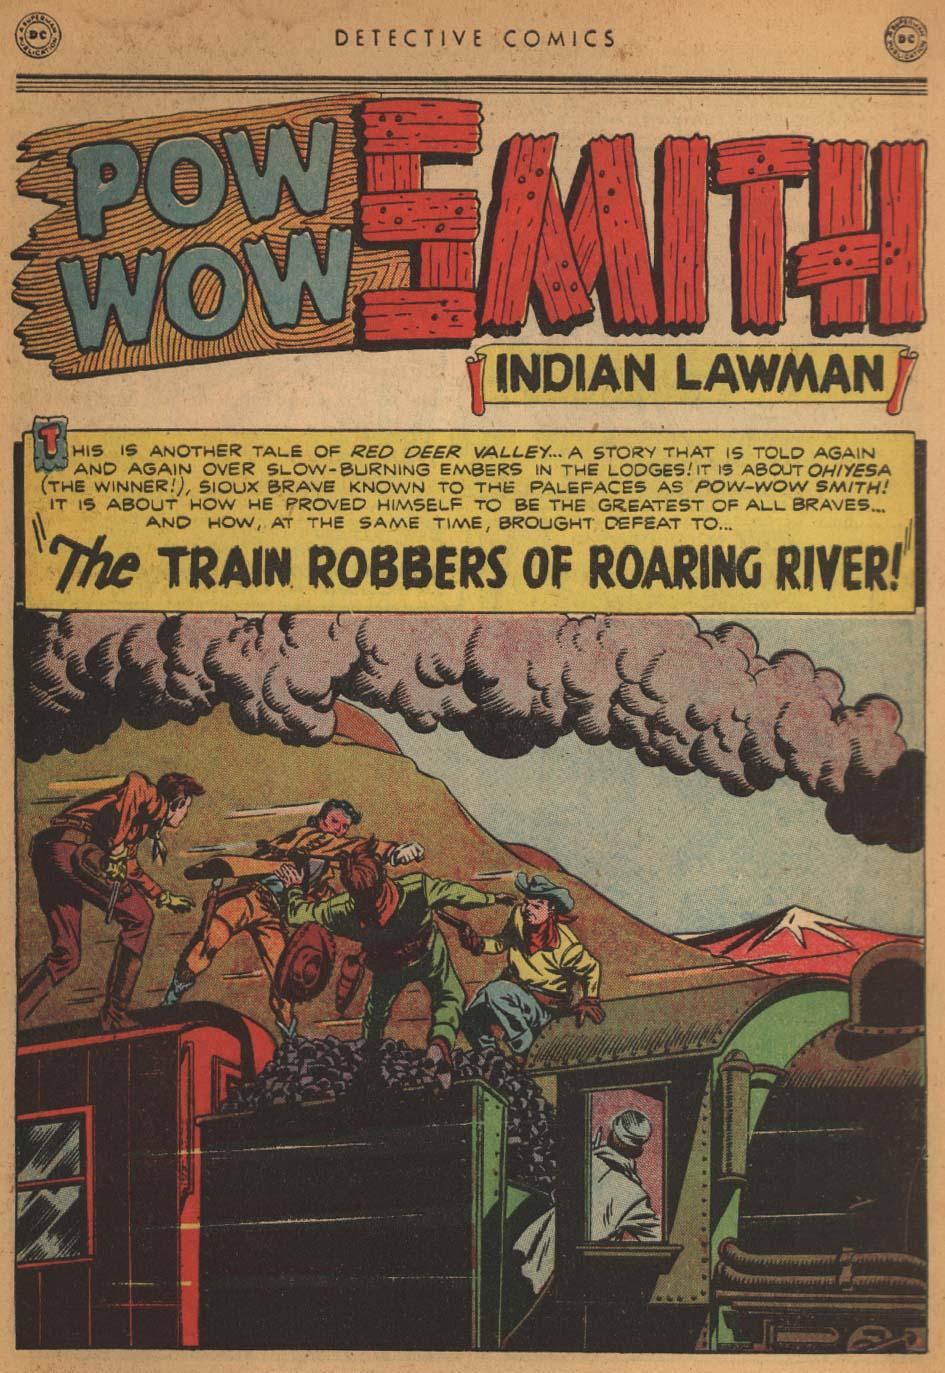 Read online Detective Comics (1937) comic -  Issue #152 - 39